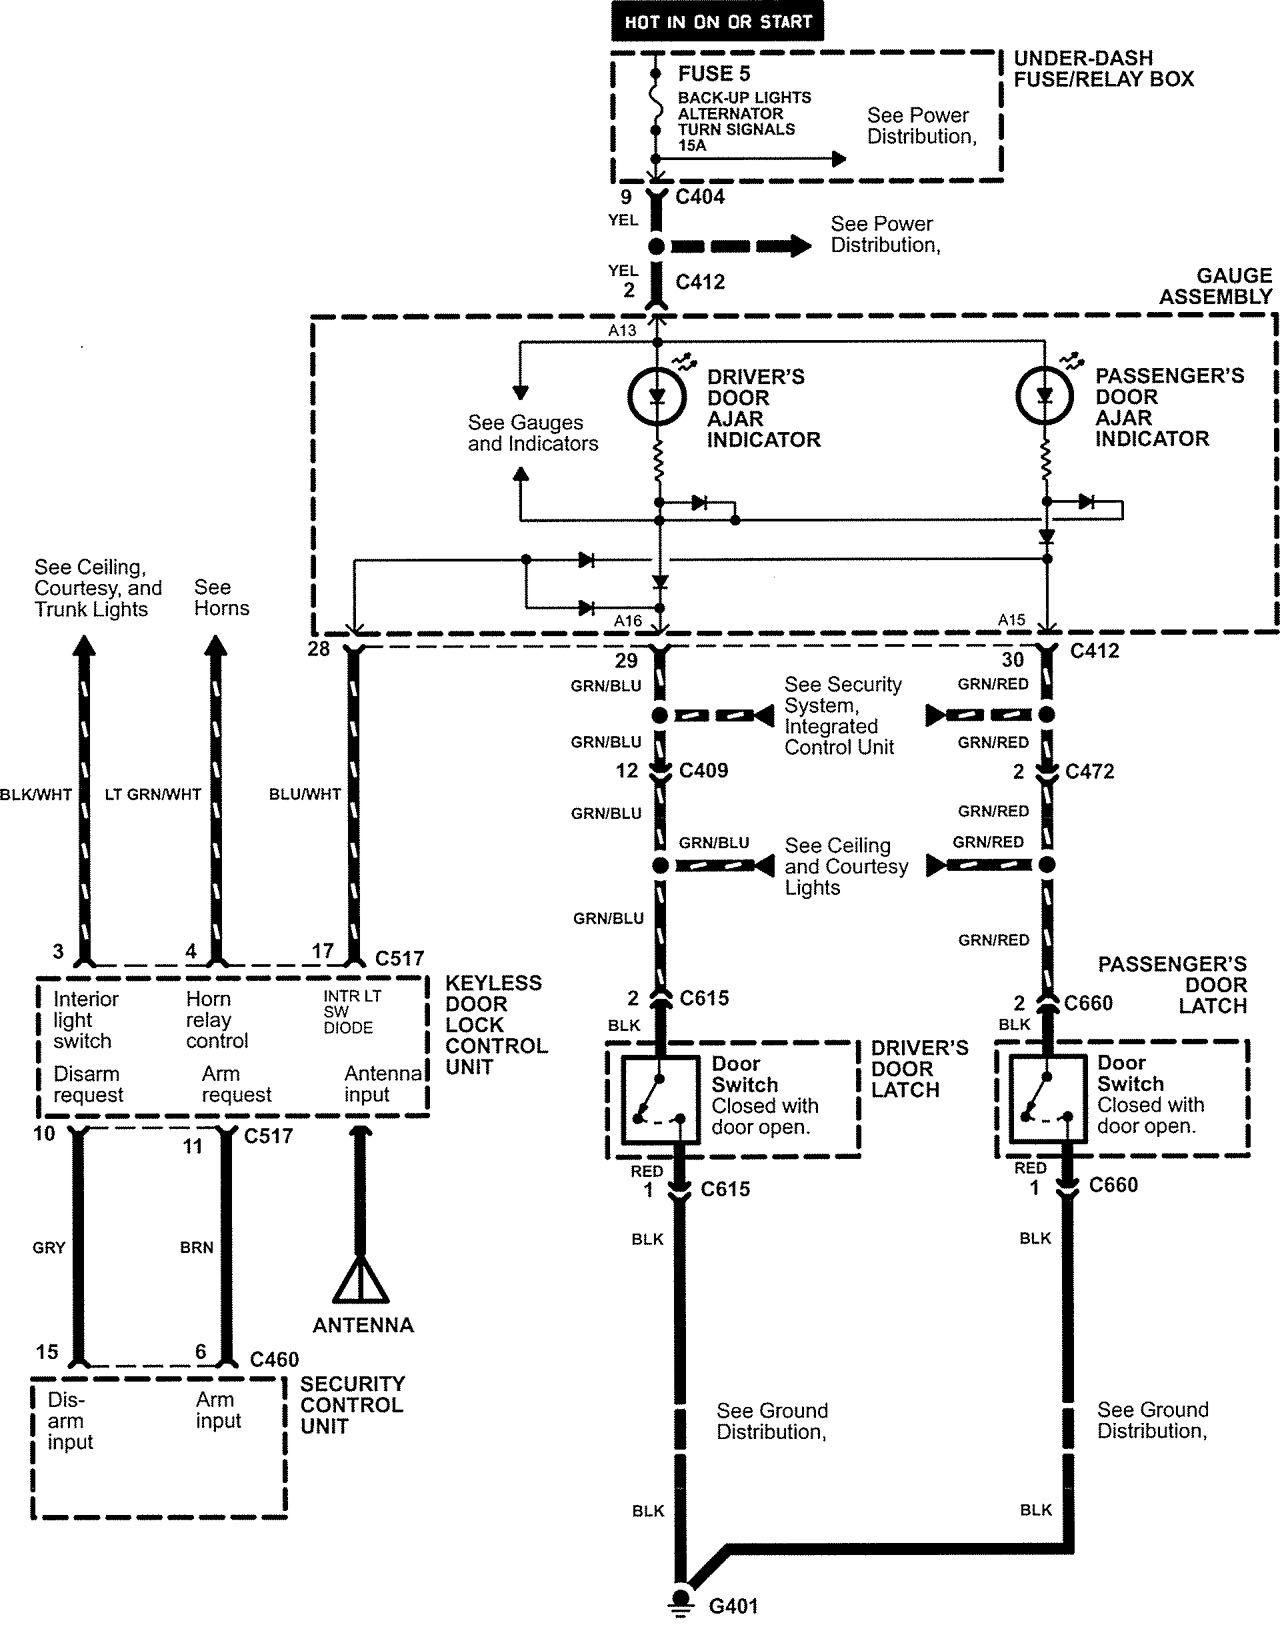 Acura Nsx 2005 Wiring Diagrams Power Locks Carknowledge Diagram